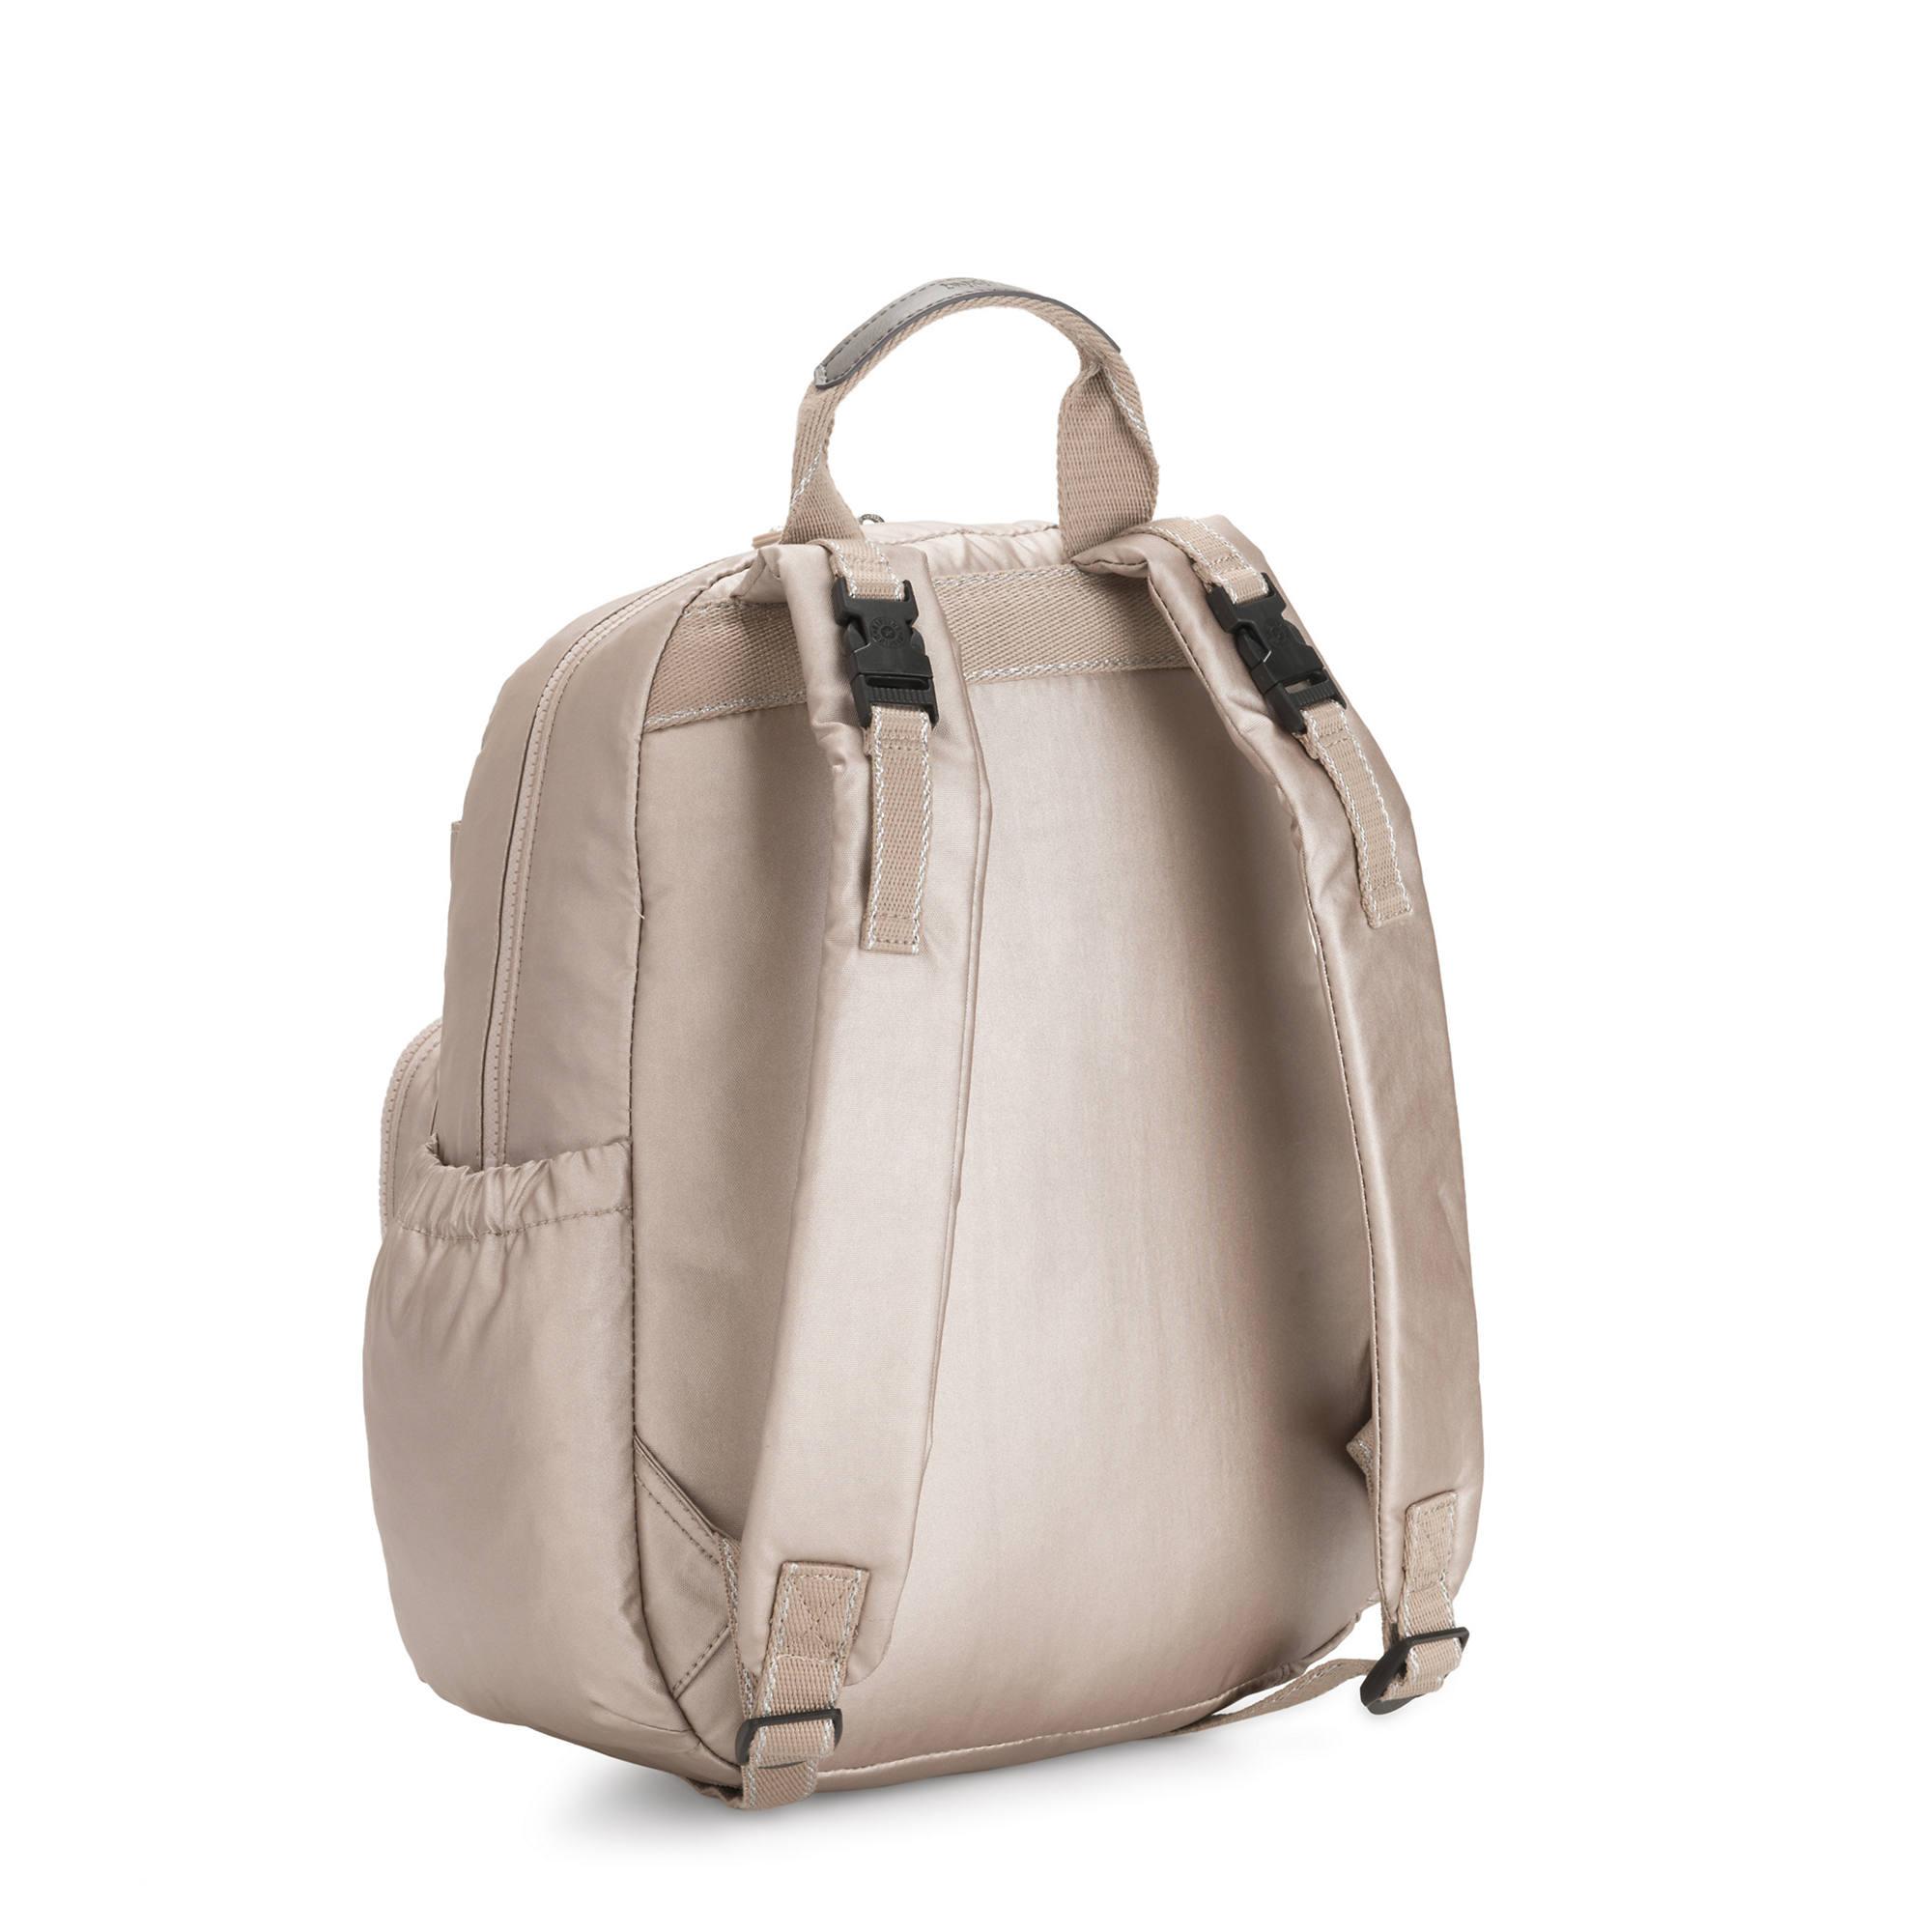 Kipling Maisie Metallic Diaper Bag Backpack